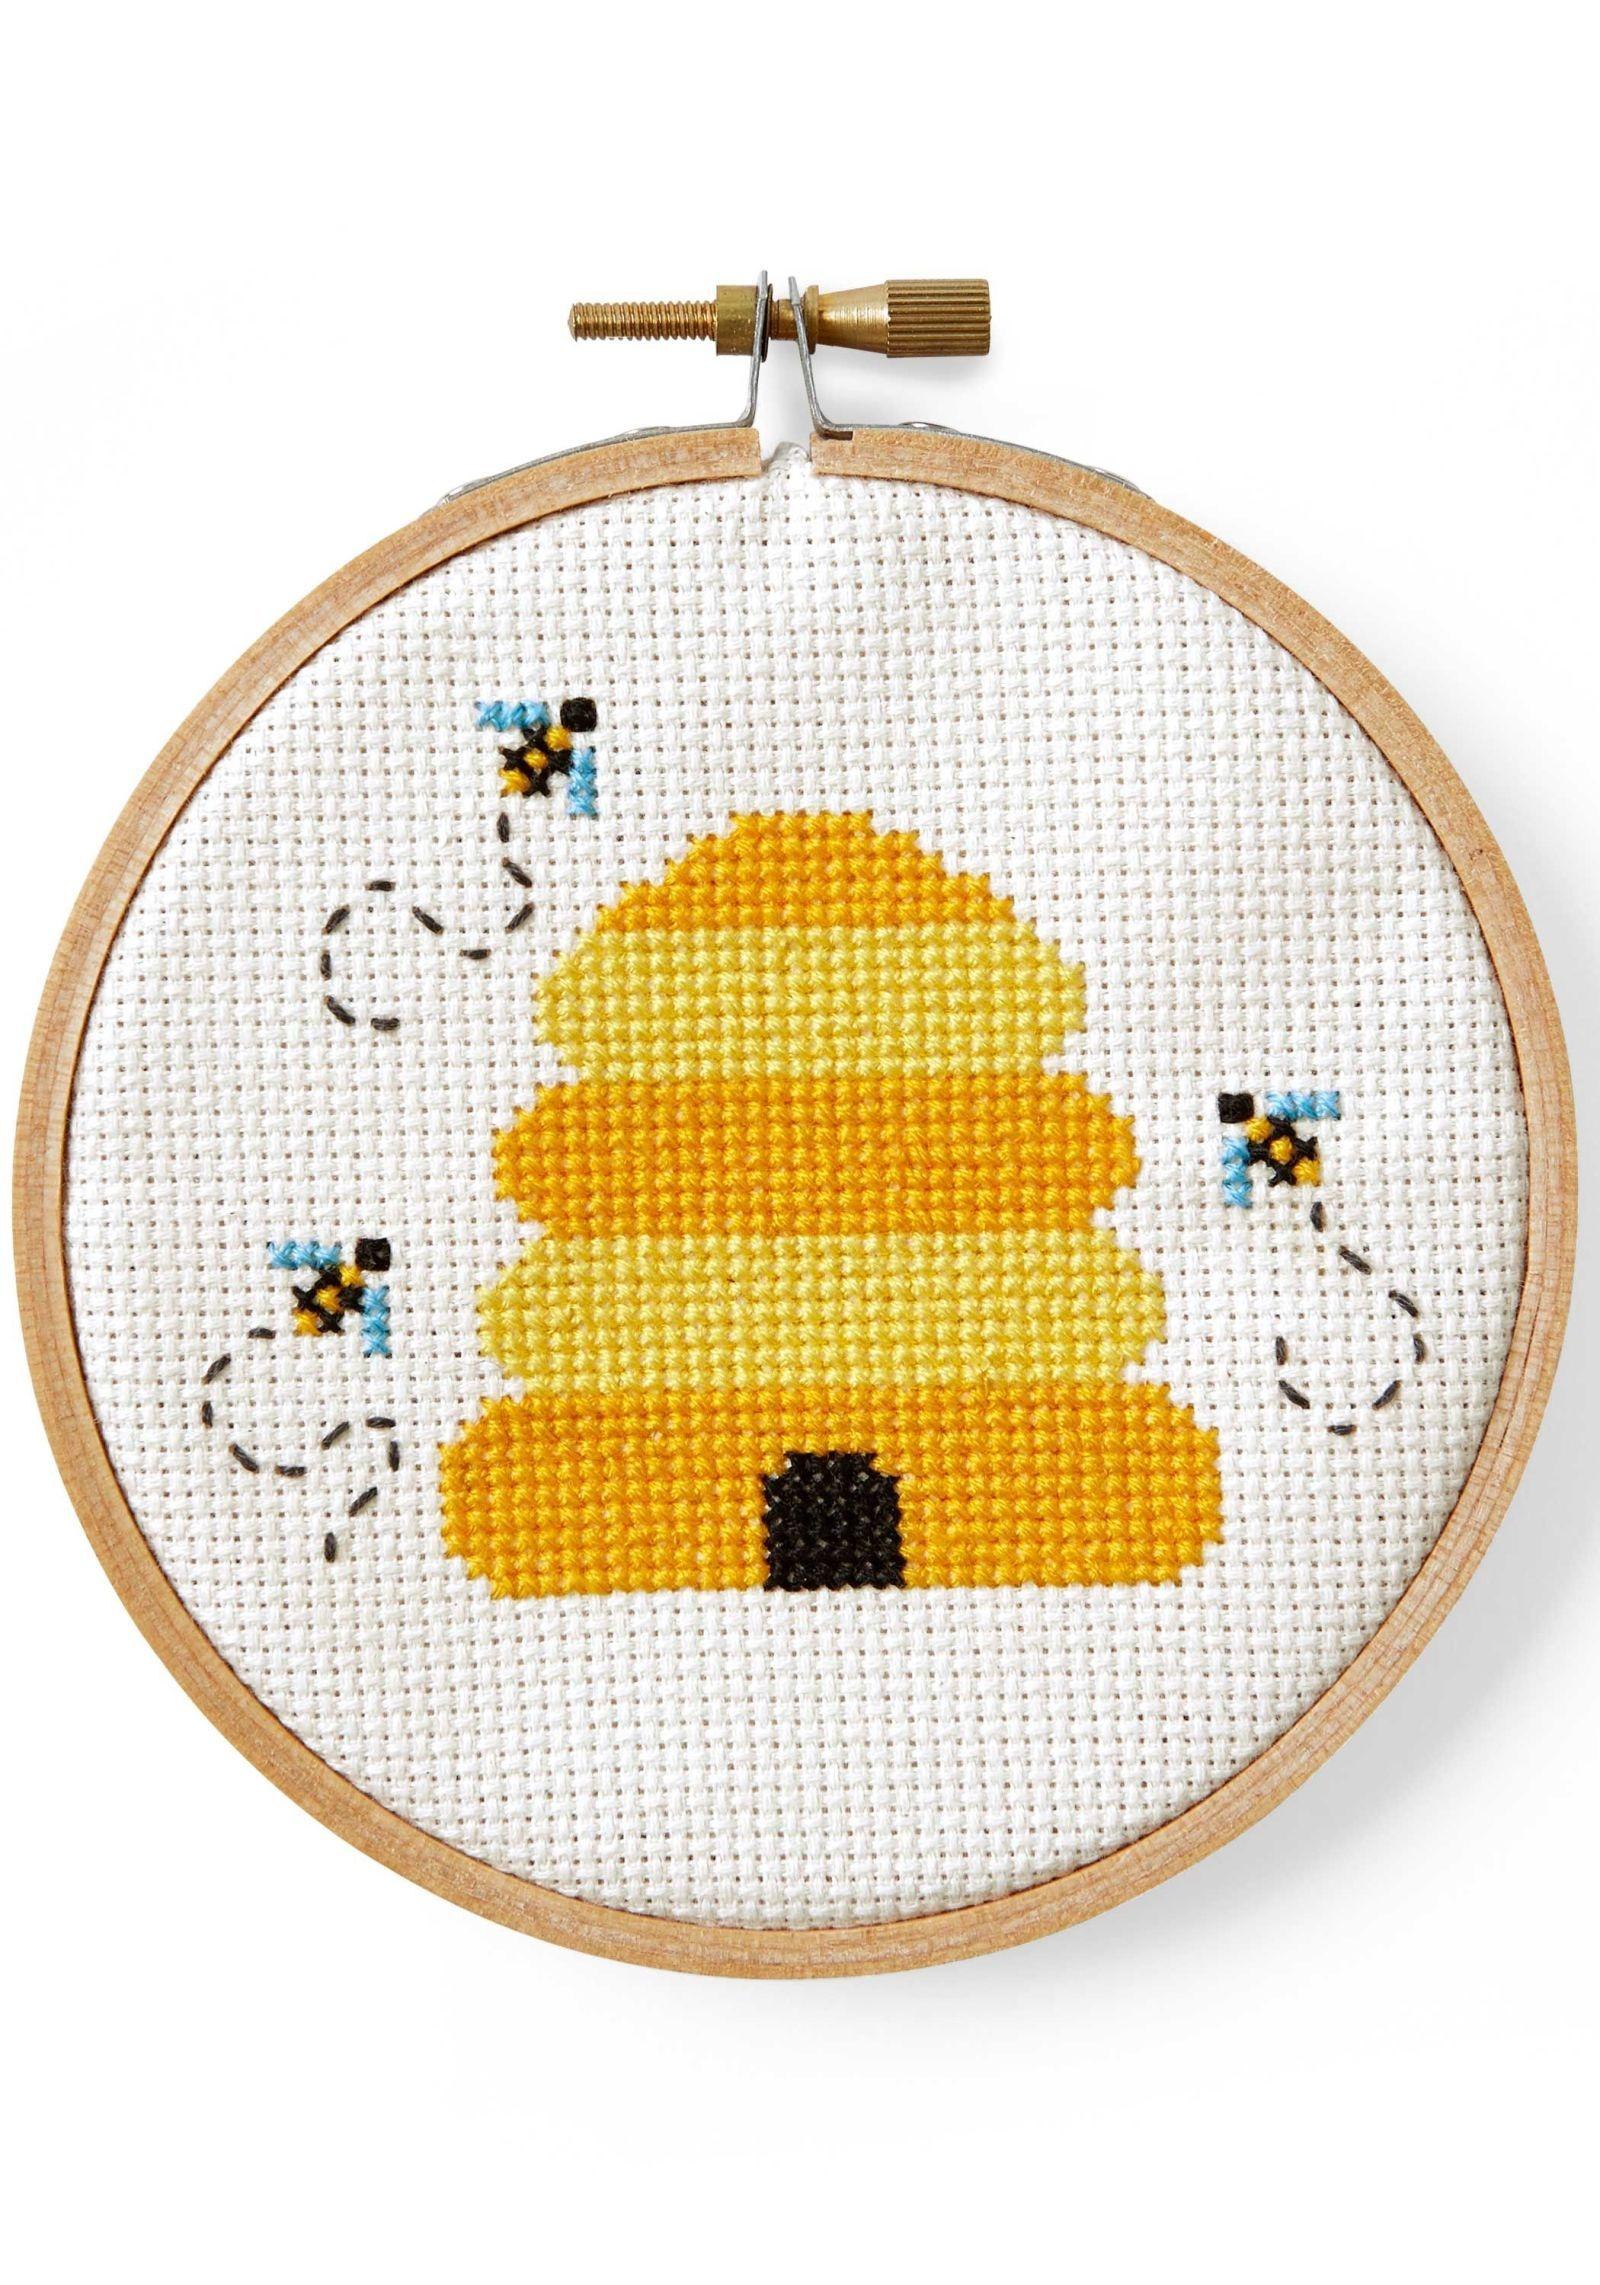 Free Cross Stitch Patterns | Craft Crack | Cross Stitch Patterns - Free Printable Modern Cross Stitch Patterns